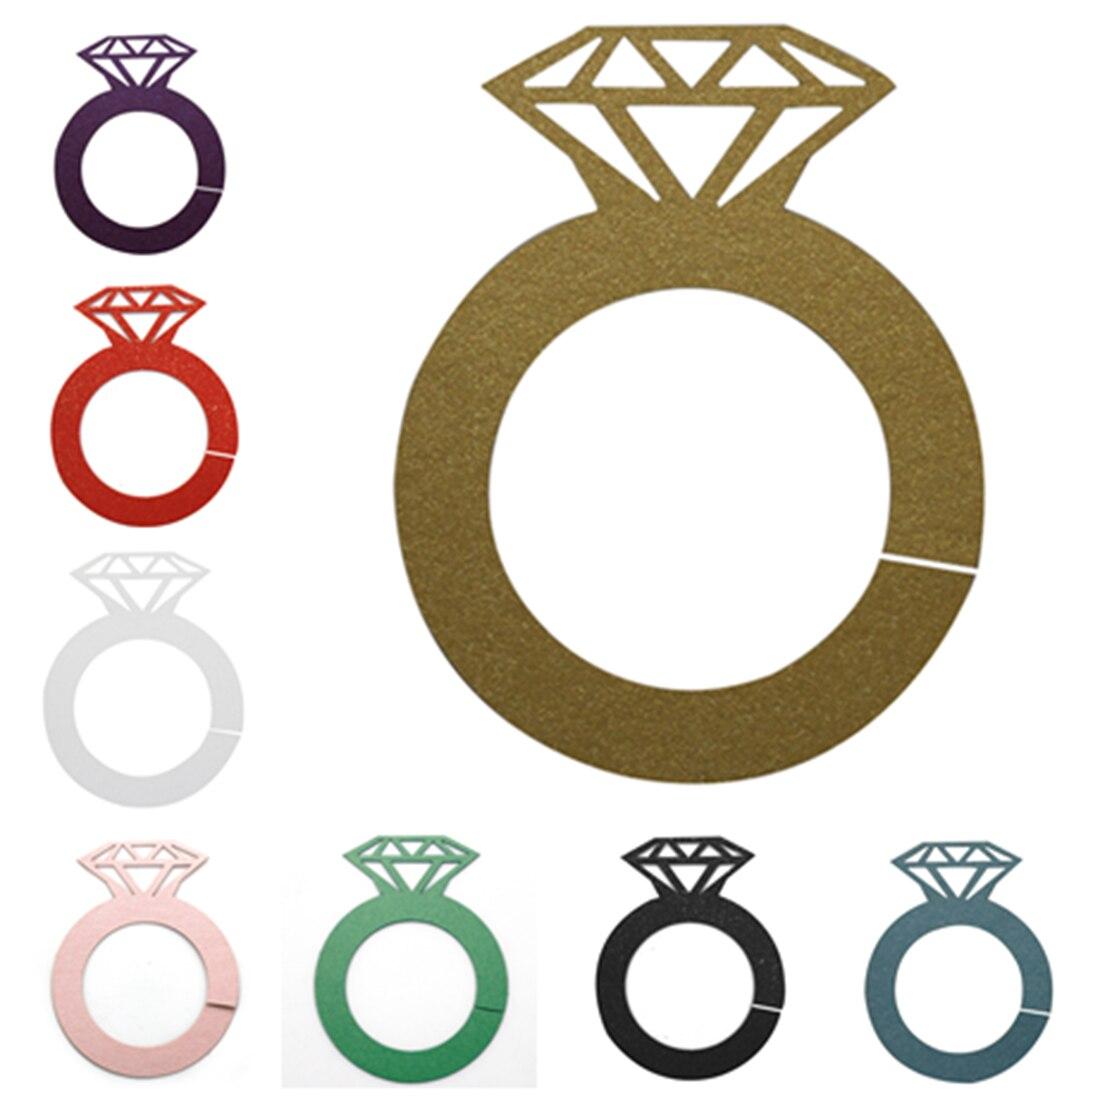 Creative 12Pcs Wine Charms Wine Tags Name Tags Diamond Rings Shape ...